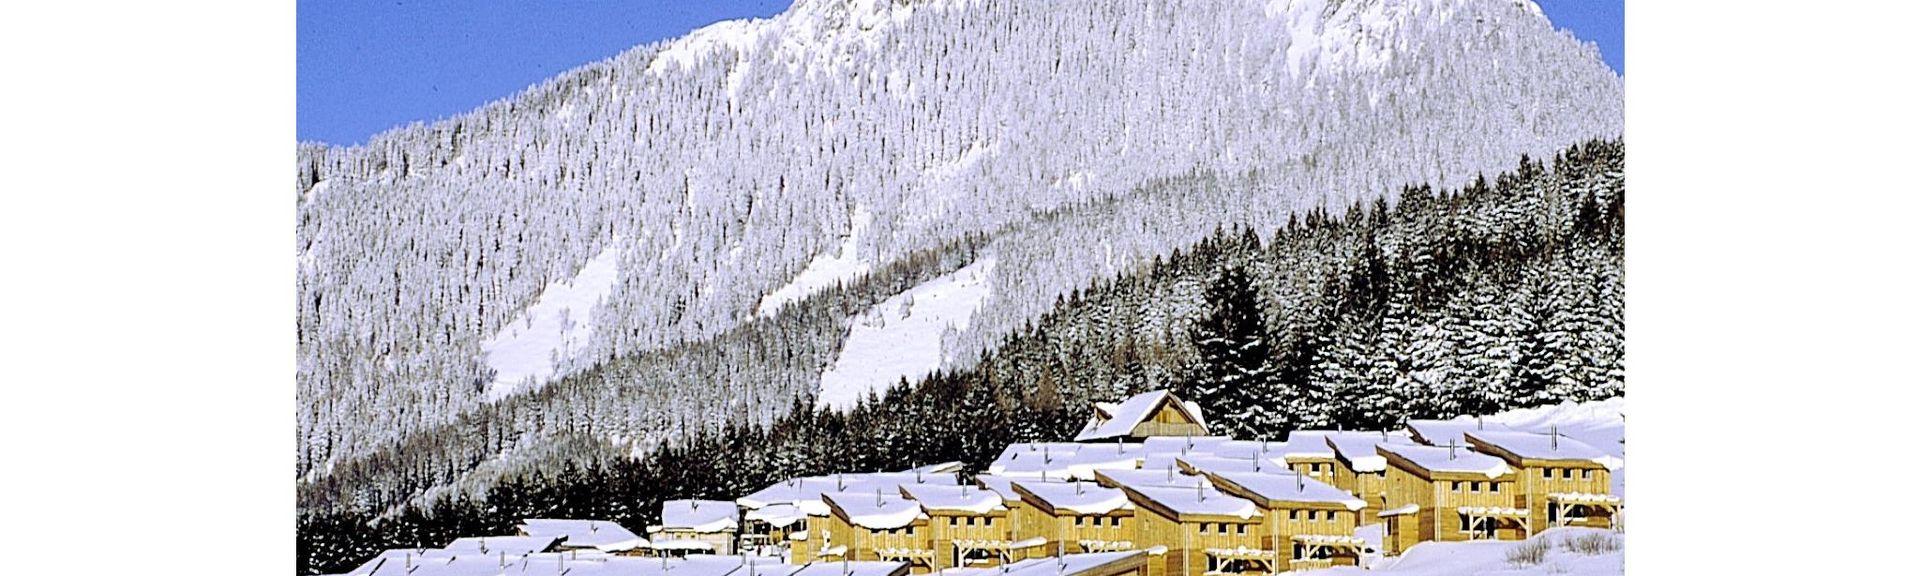 Estación de tren de Admont Frauenberg an der Enns, Admont, Styria, Austria